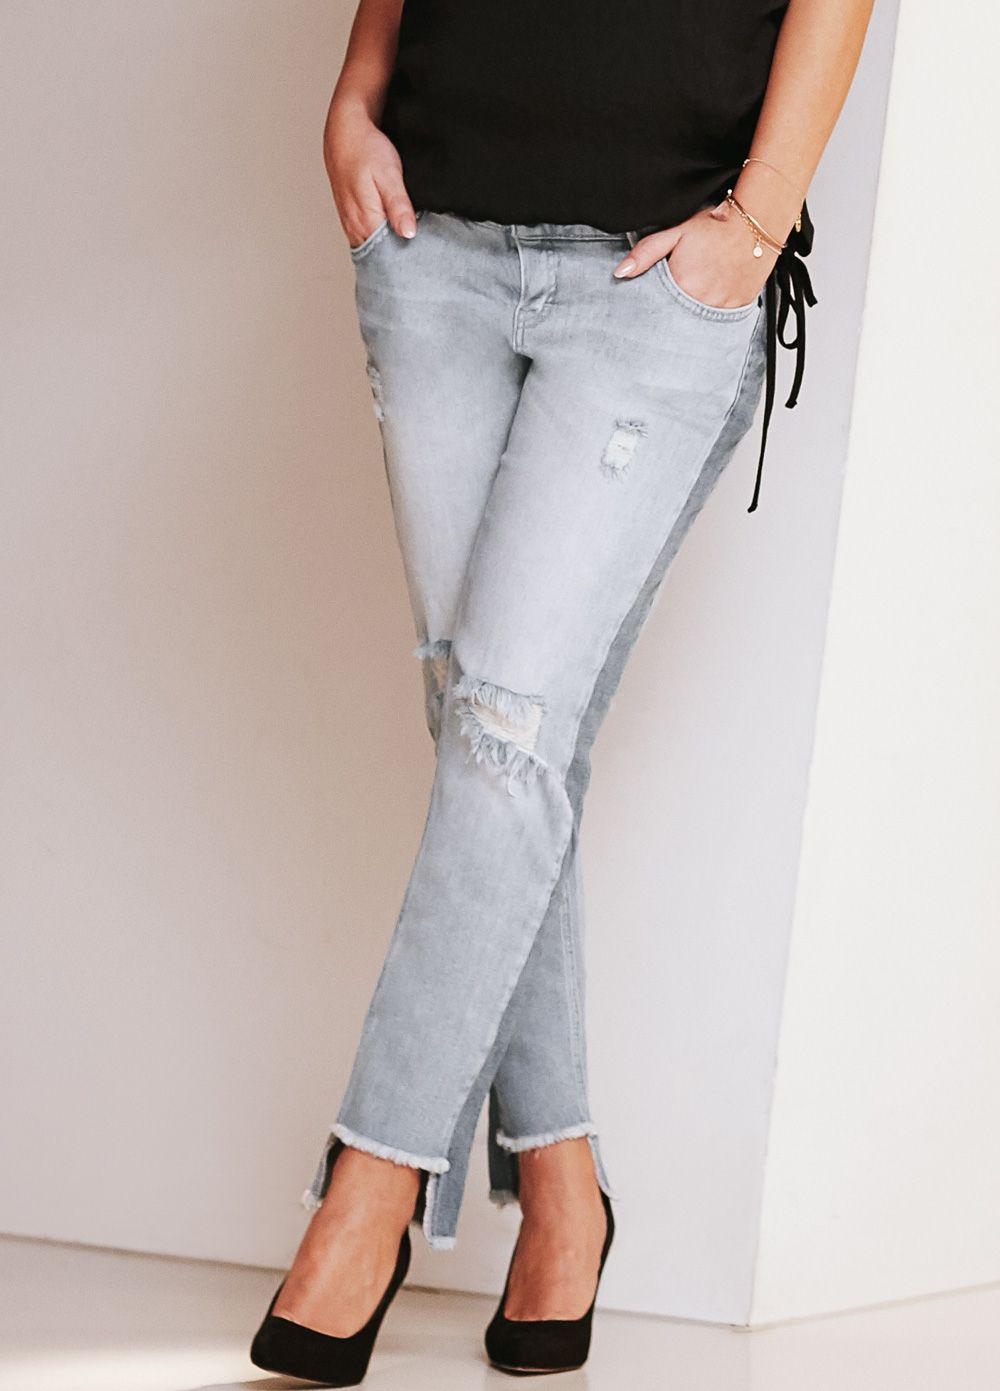 73c3090ce546d Supermom - Distressed Step Hem Boyfriend Jeans Boyfriend Fit Jeans, Supermom,  Maternity Jeans,